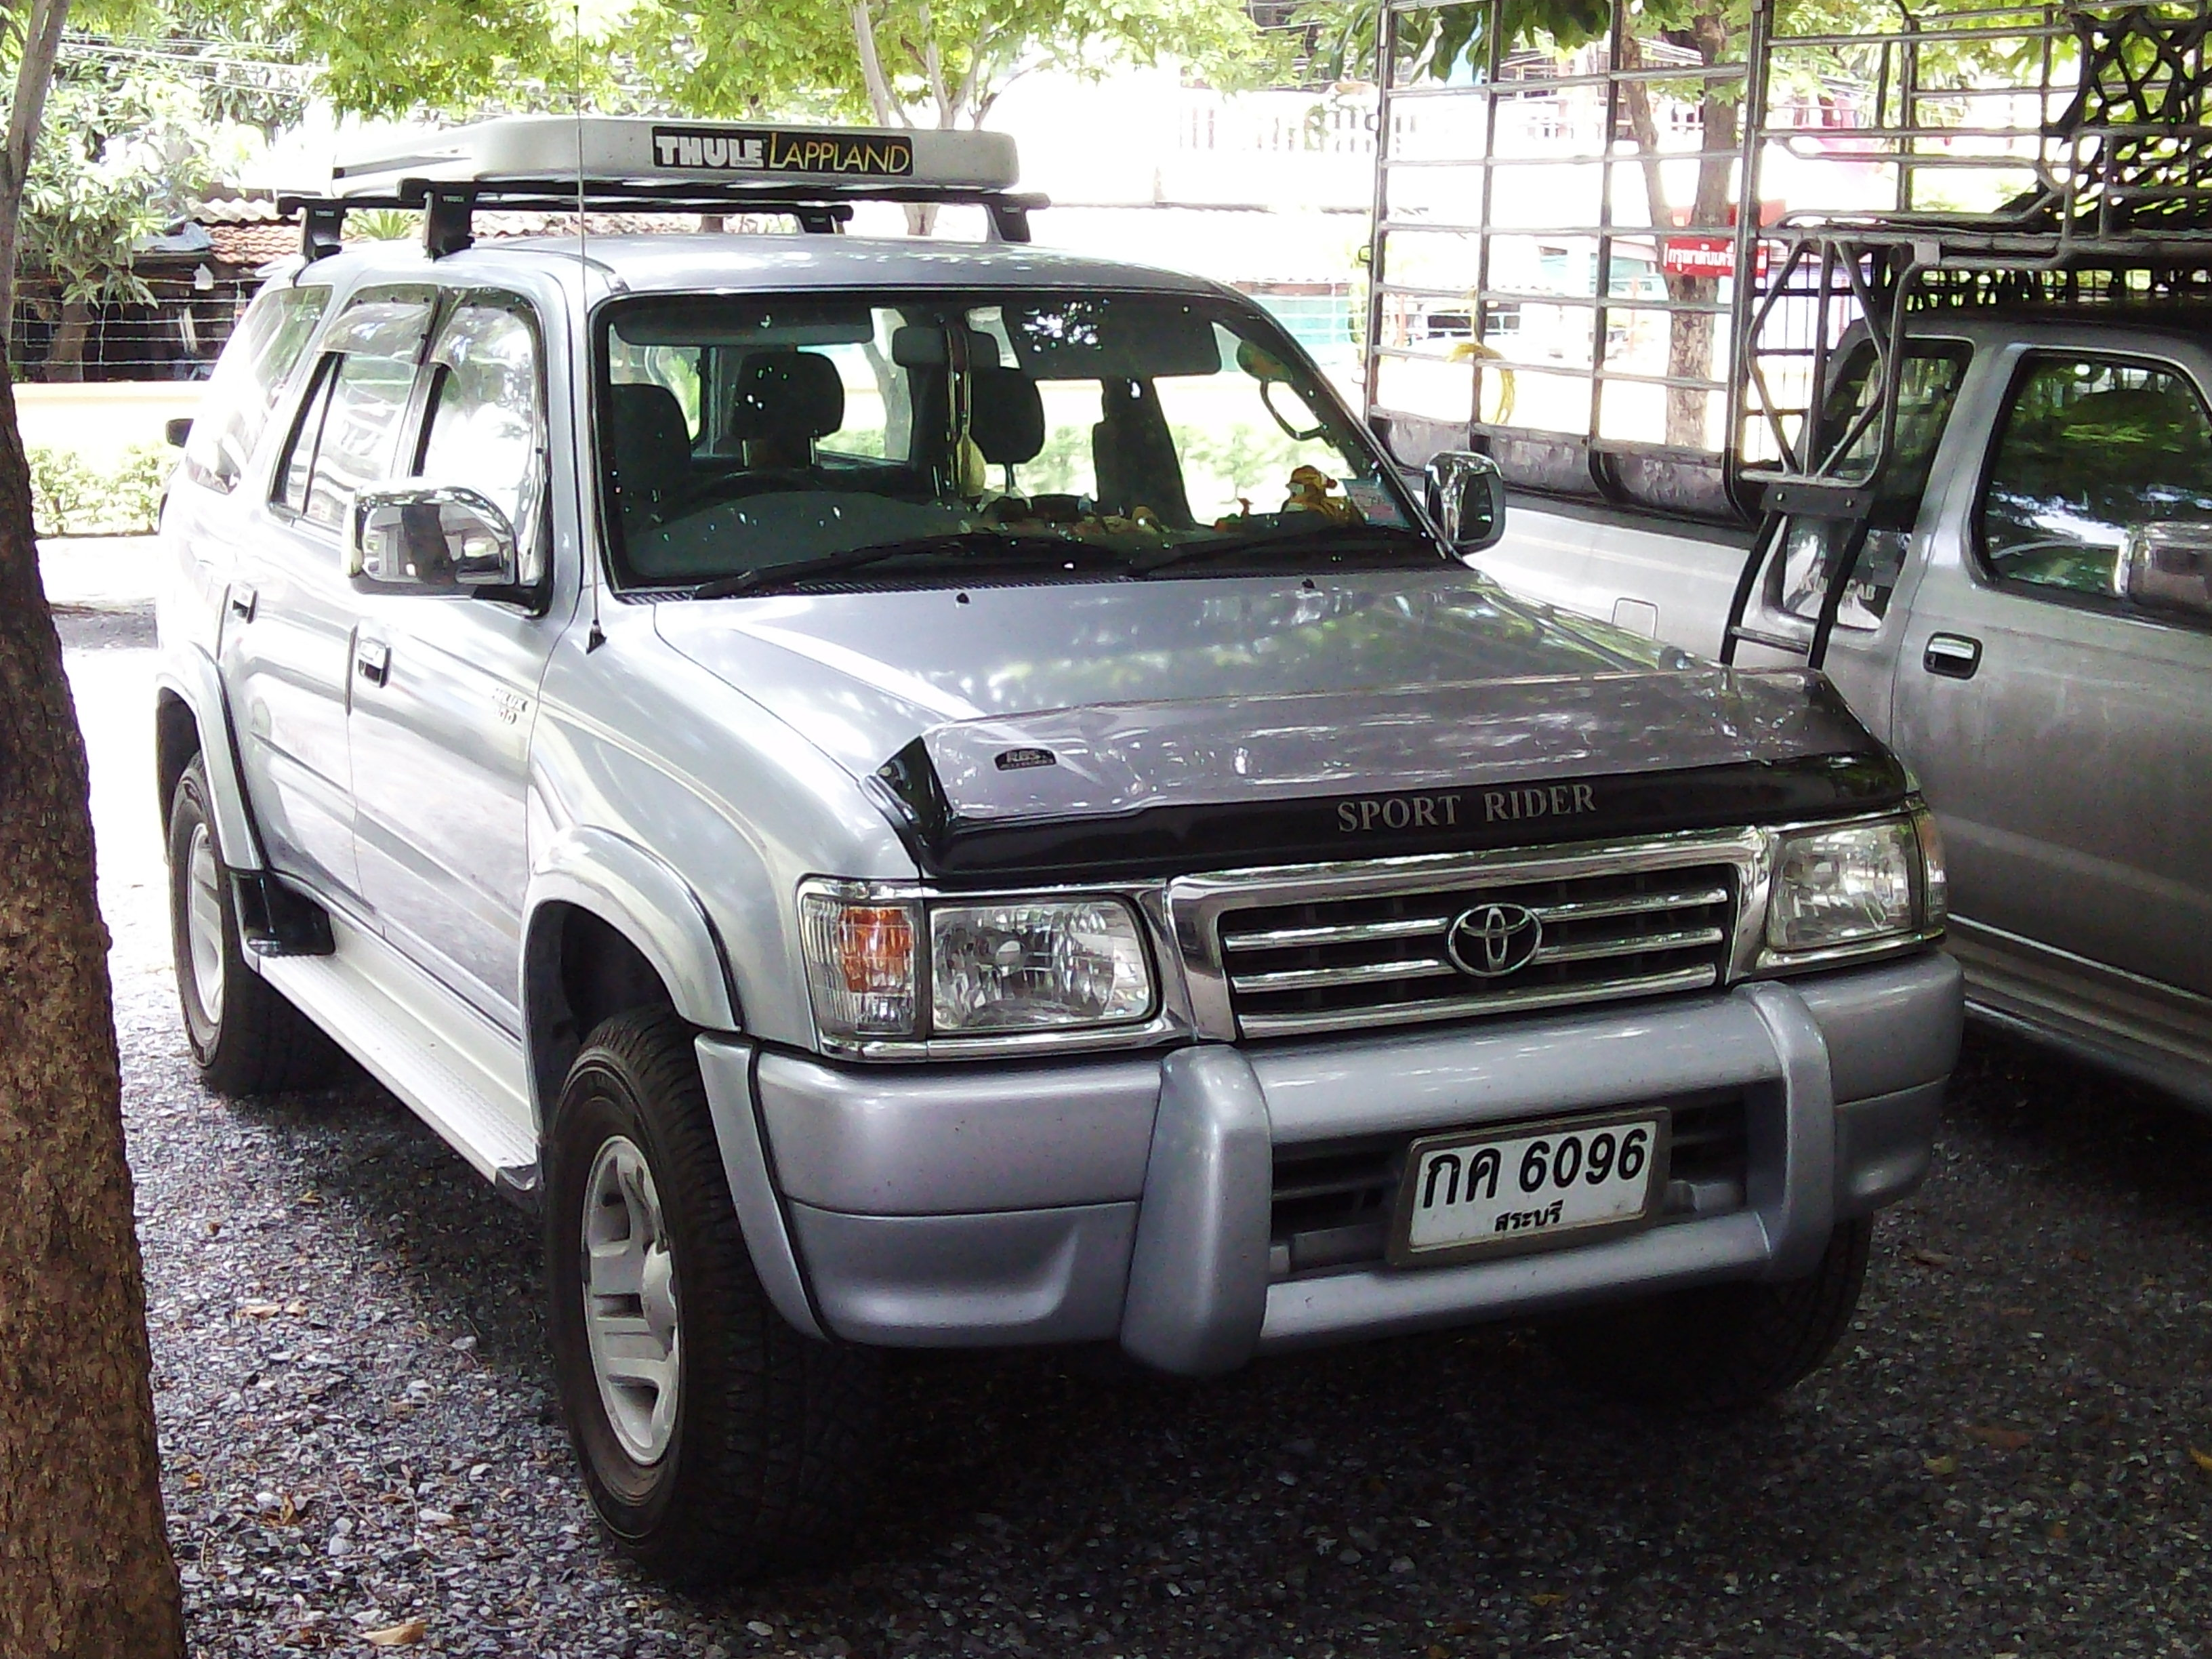 File:Toyota HiLux Sport Rider In Thailand 01